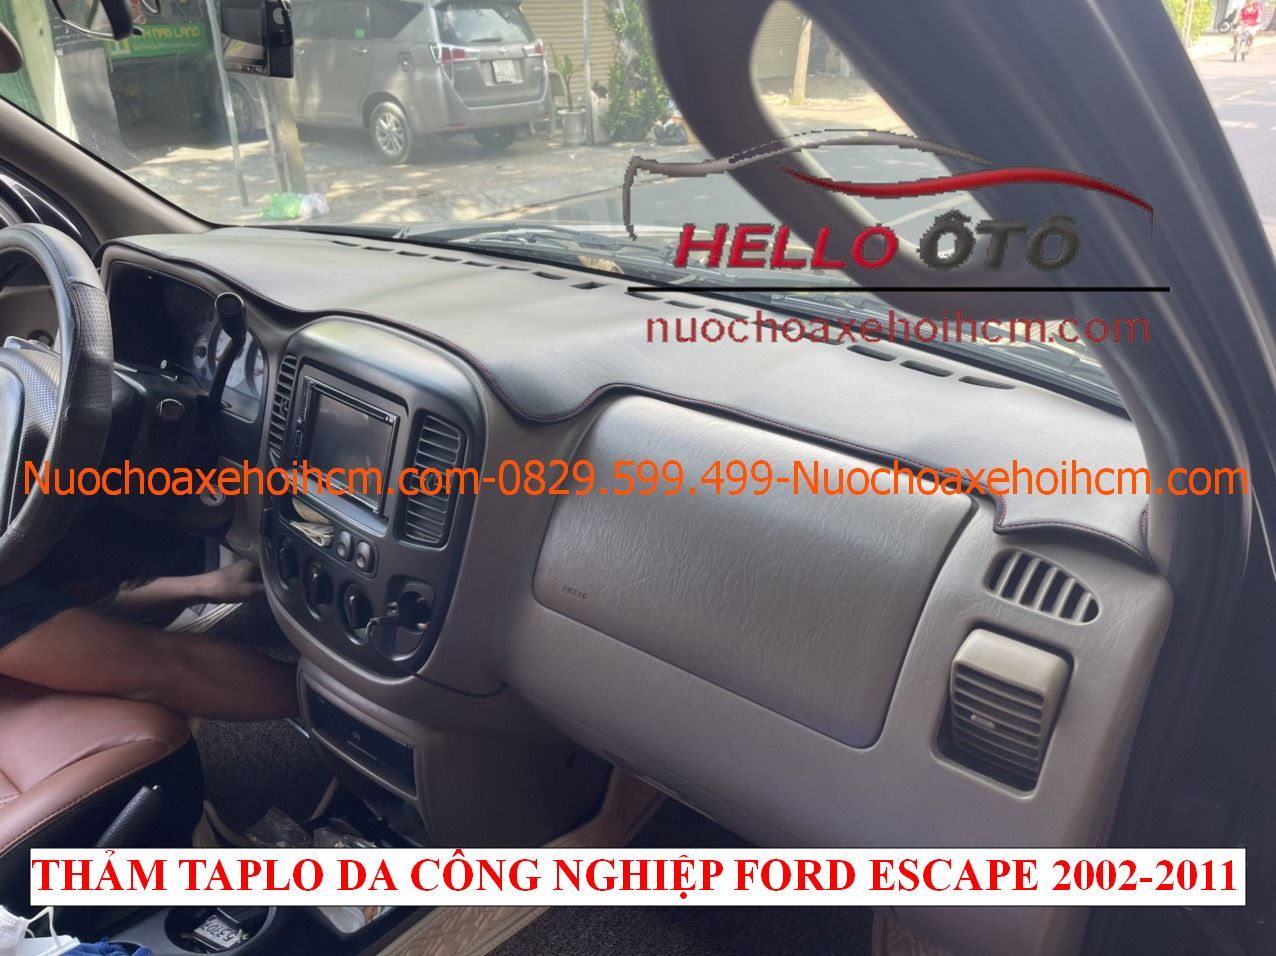 Thảm taplo Da Công nghiệp Ford Escape 2002-2011